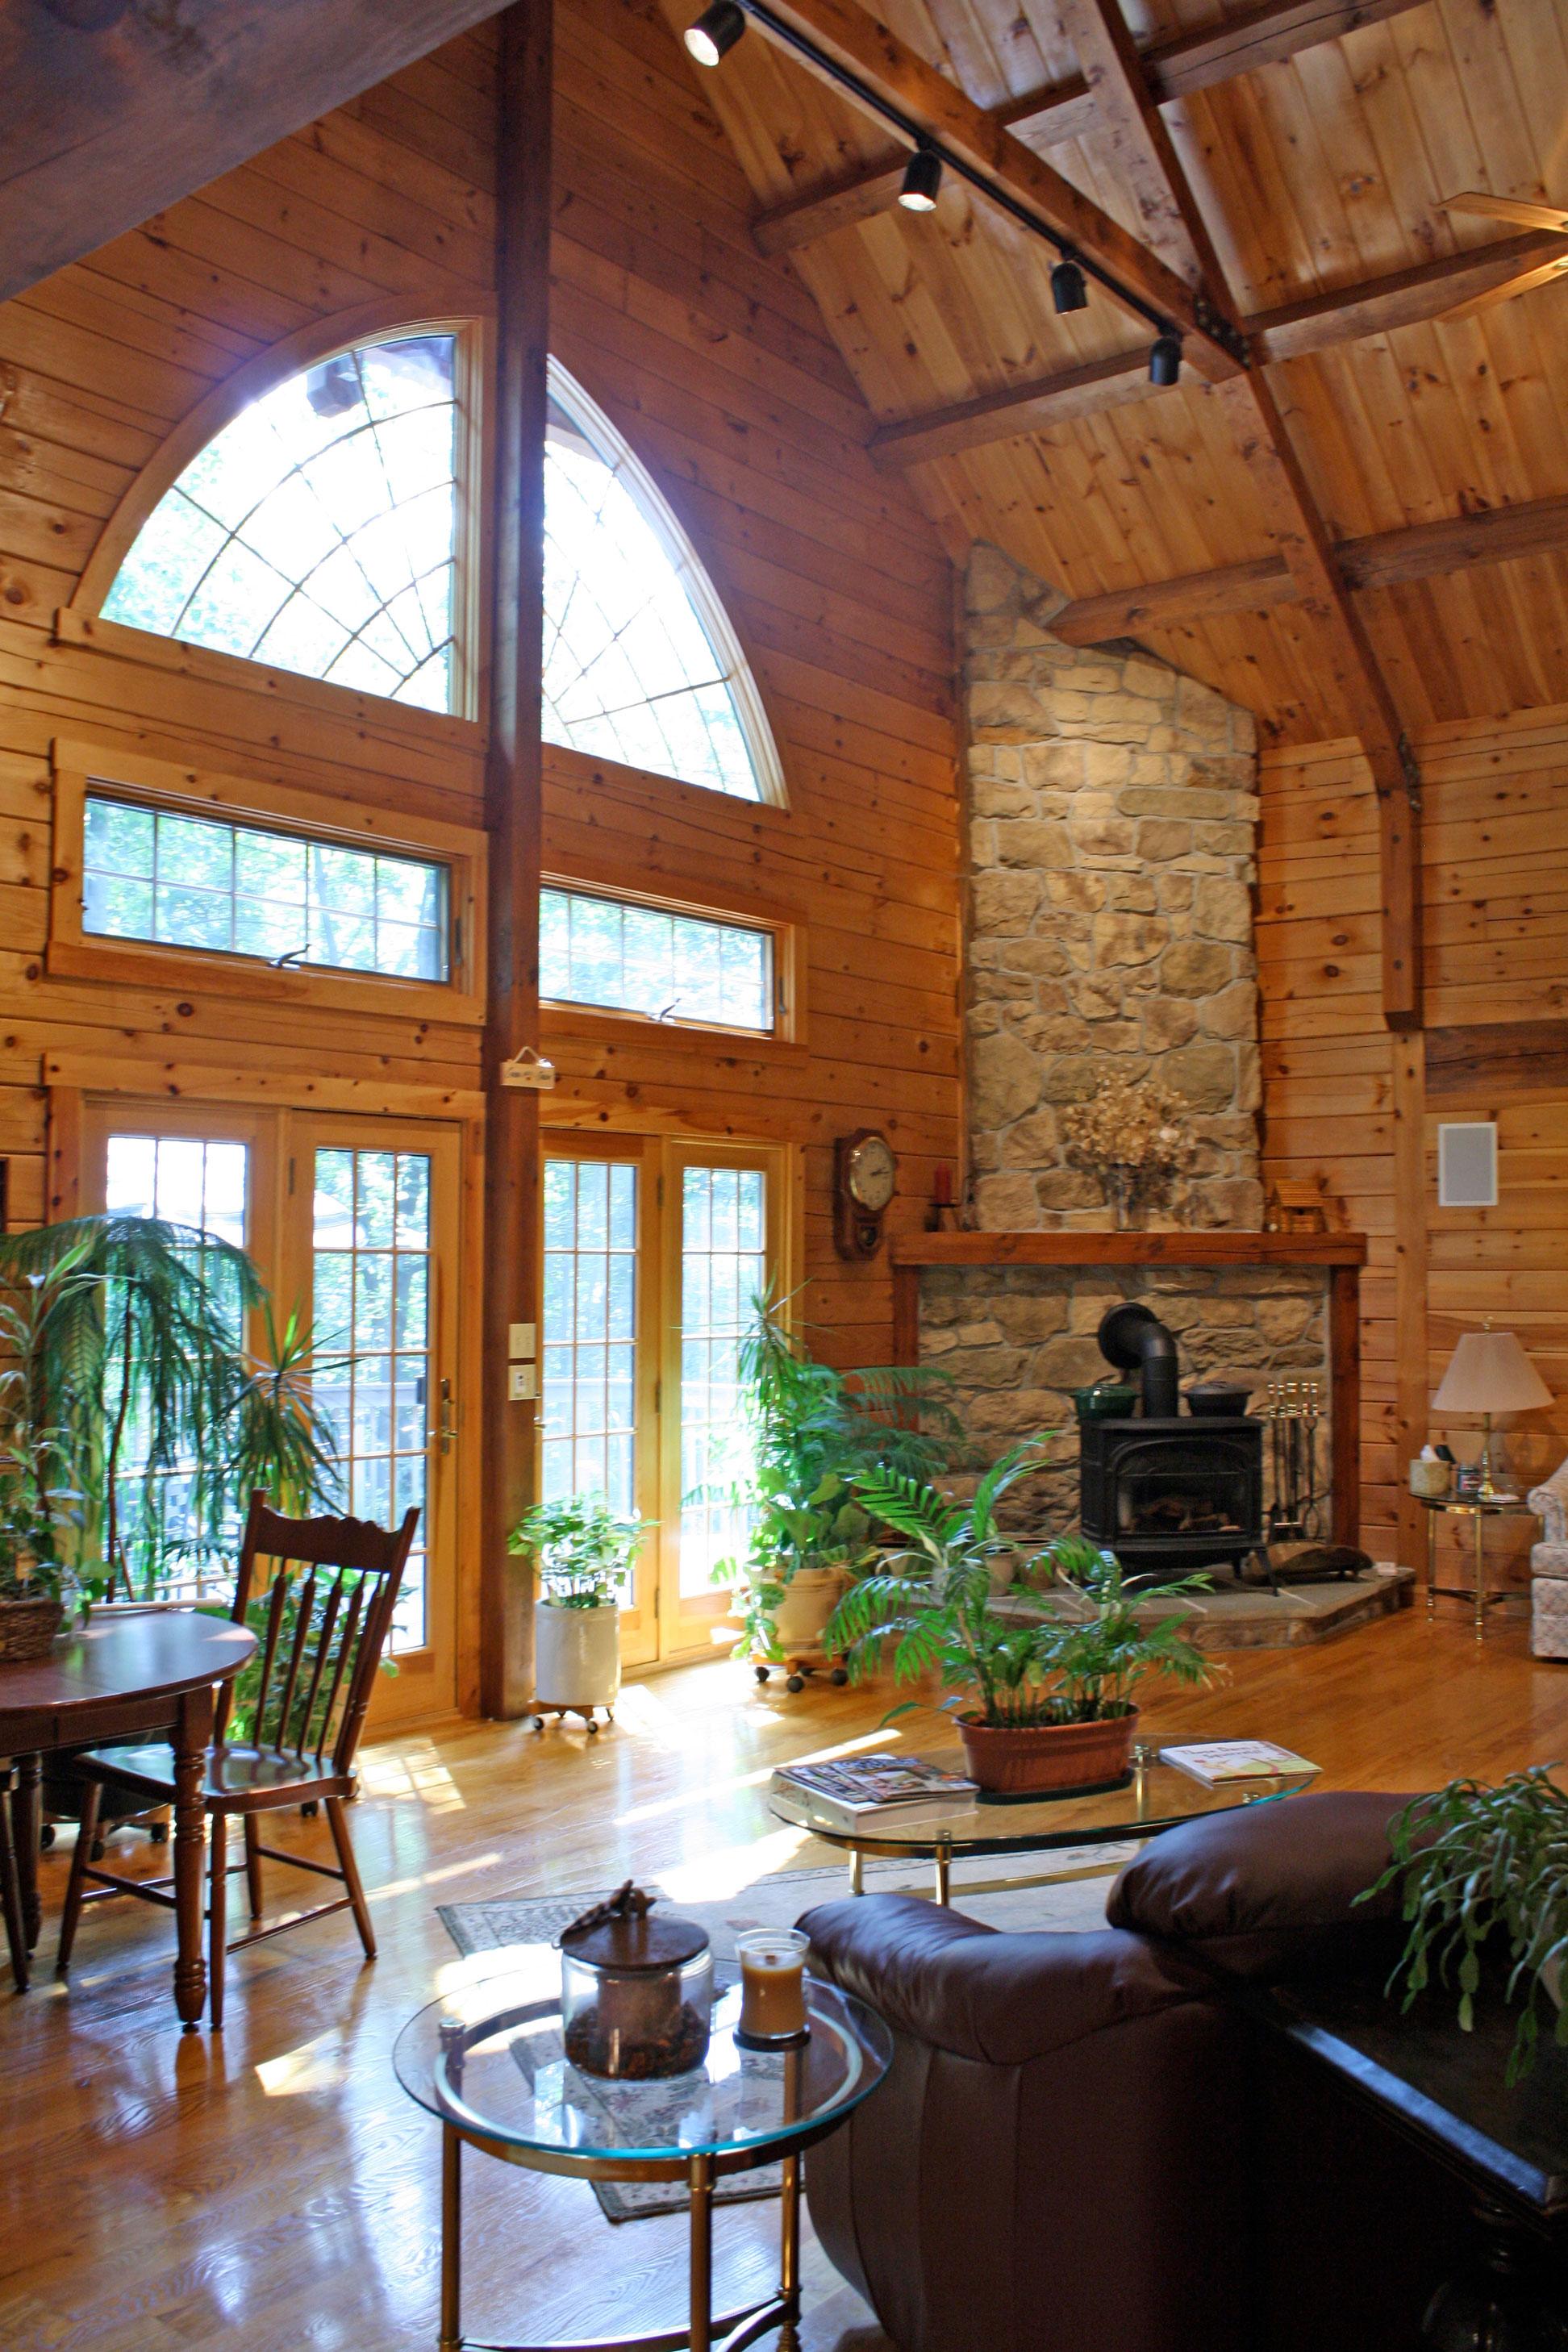 cabin-interior-fireplace.jpg